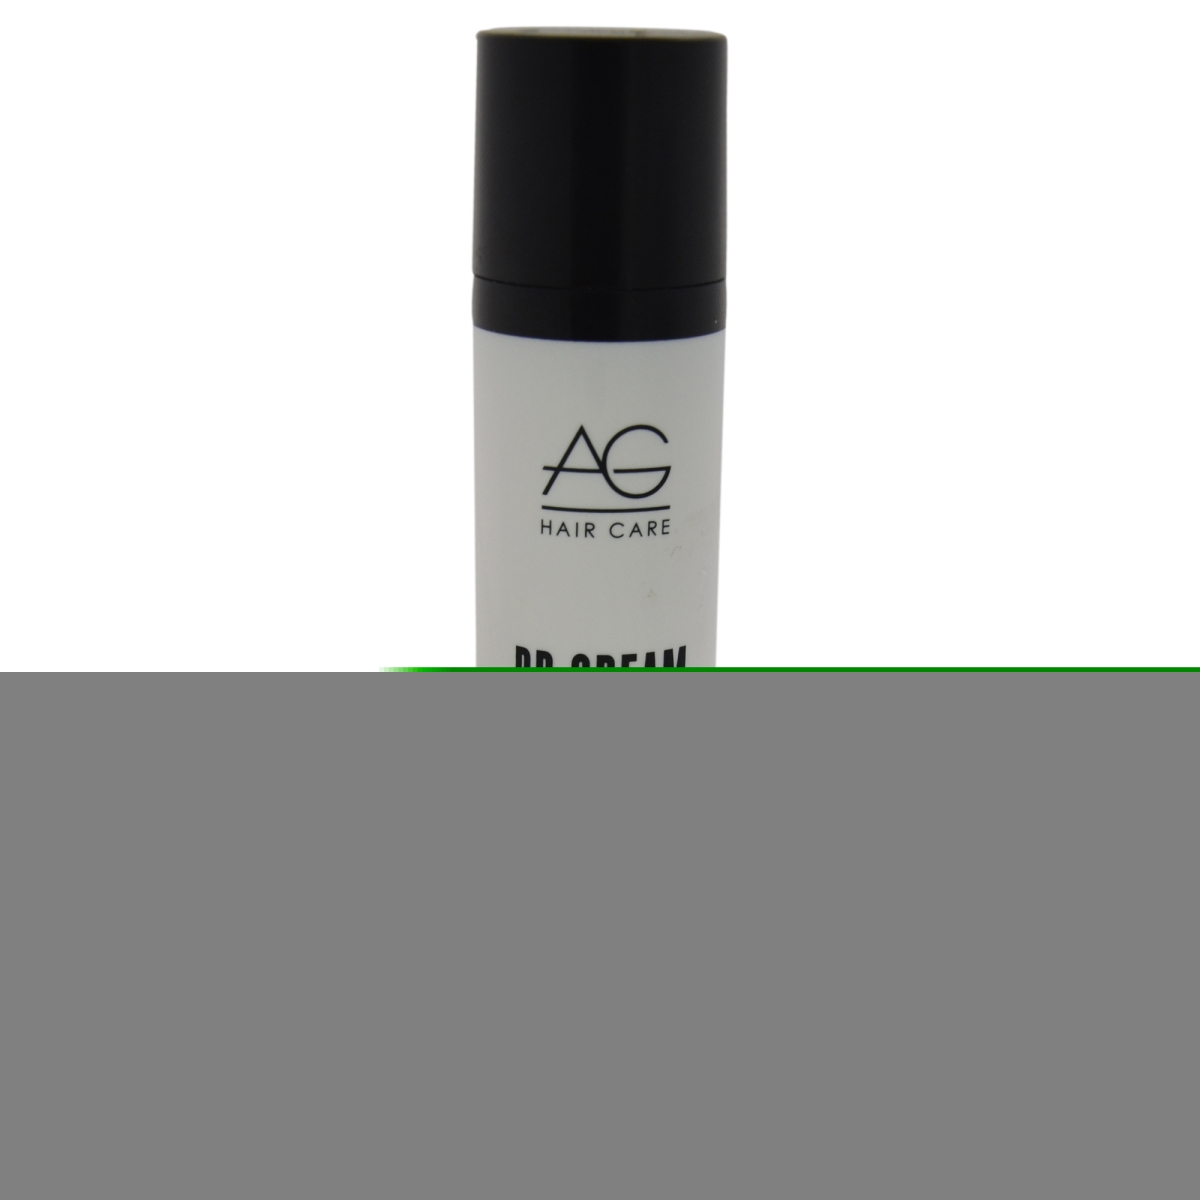 AG Hair Cosmetics U-HC-10729 BB Cream Total Benefit Hair Primer for Unisex - 3.4 oz